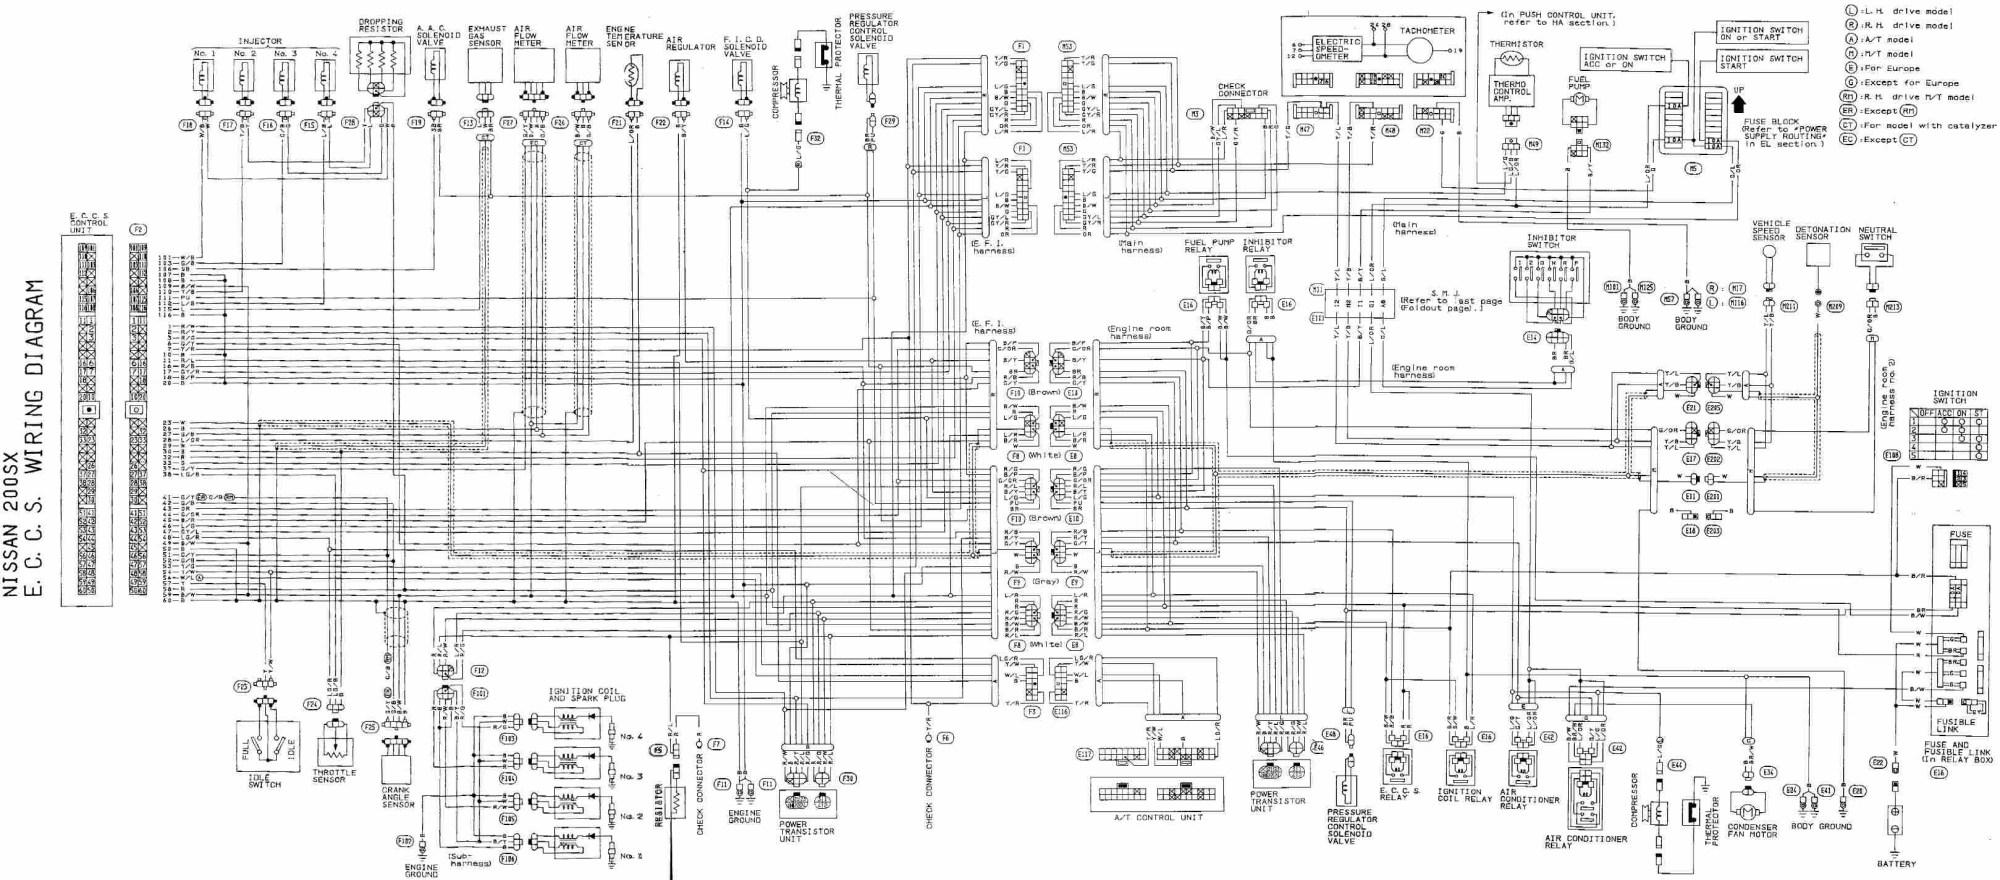 hight resolution of 2008 nissan sentra engine diagram wiring diagram sr20 engine plete eccs stunning nissan sentra